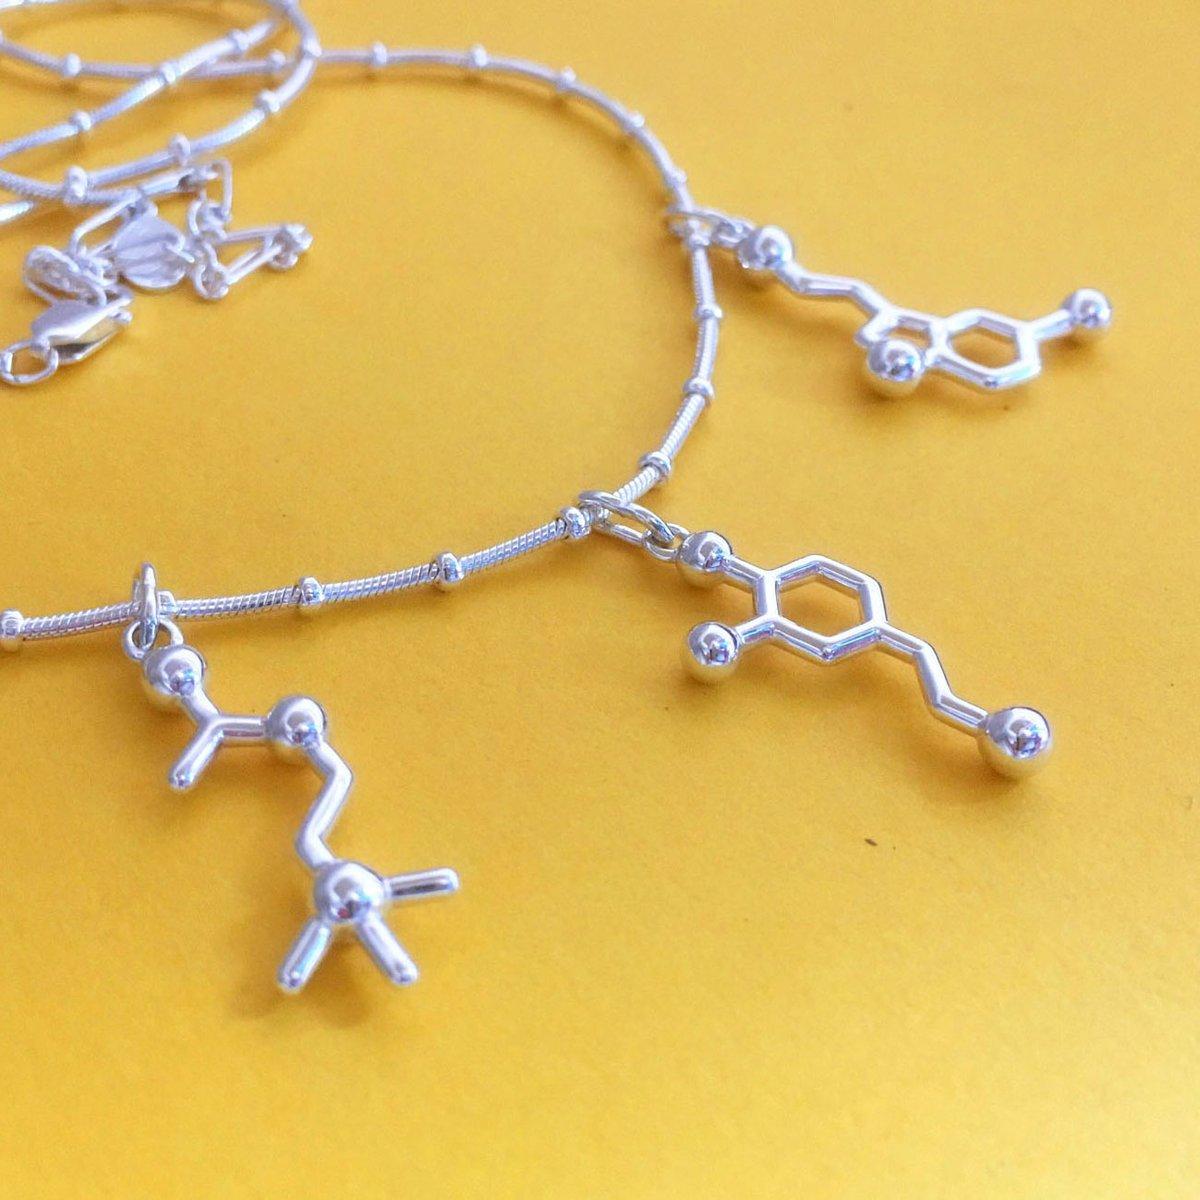 Image of creativity necklace